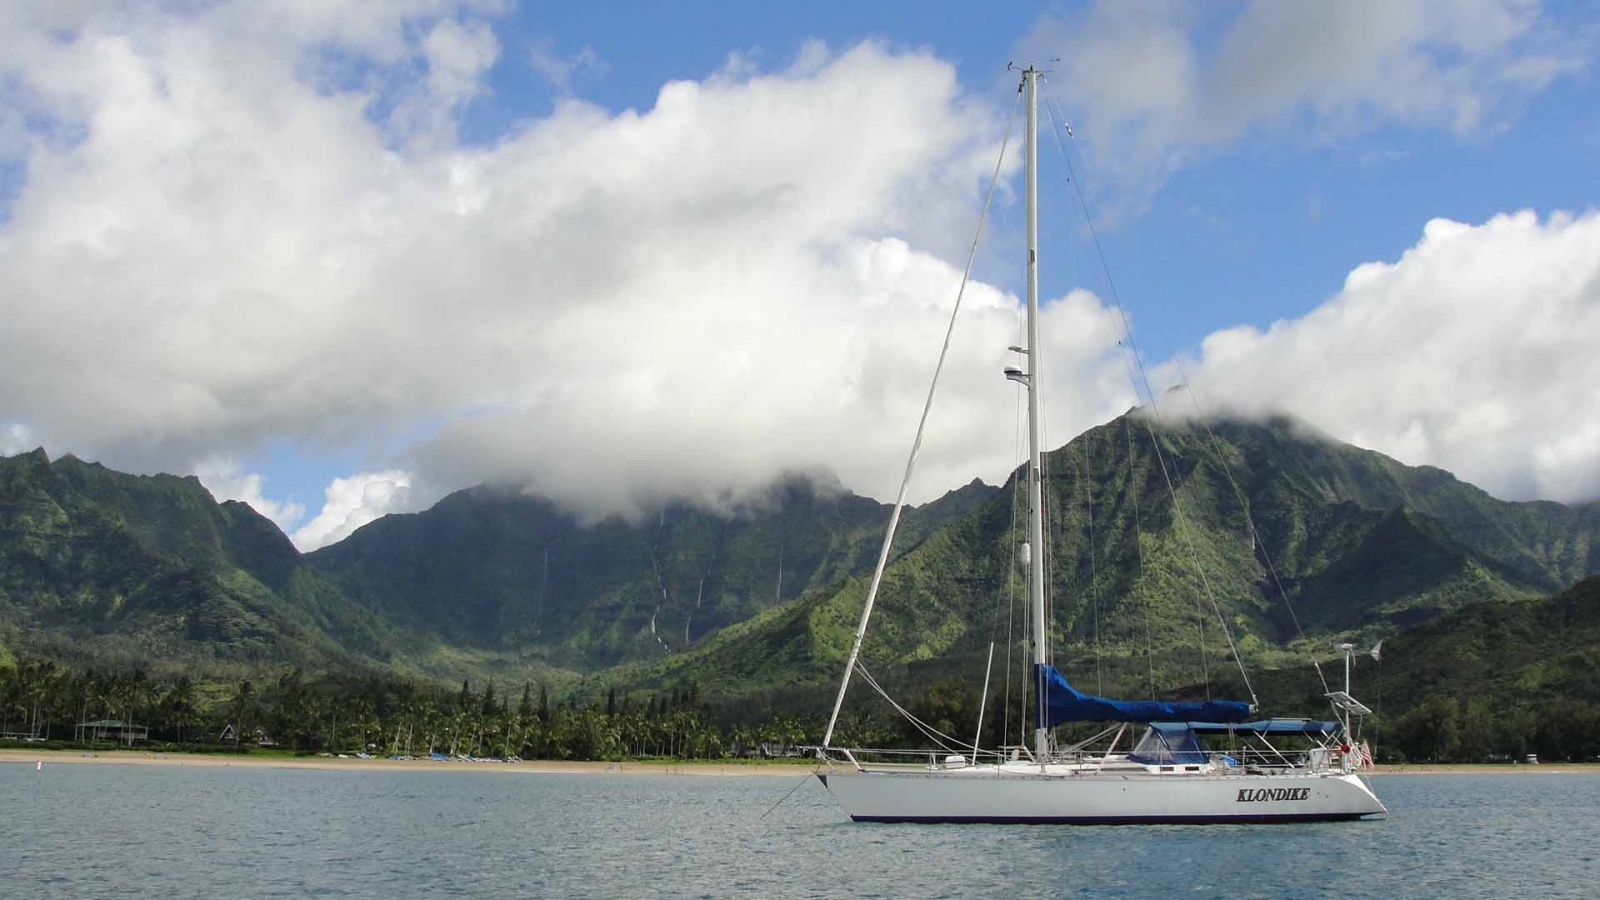 Click image for larger version  Name:klondike at Hanalei Bay Hawaii.jpg Views:335 Size:344.4 KB ID:29131